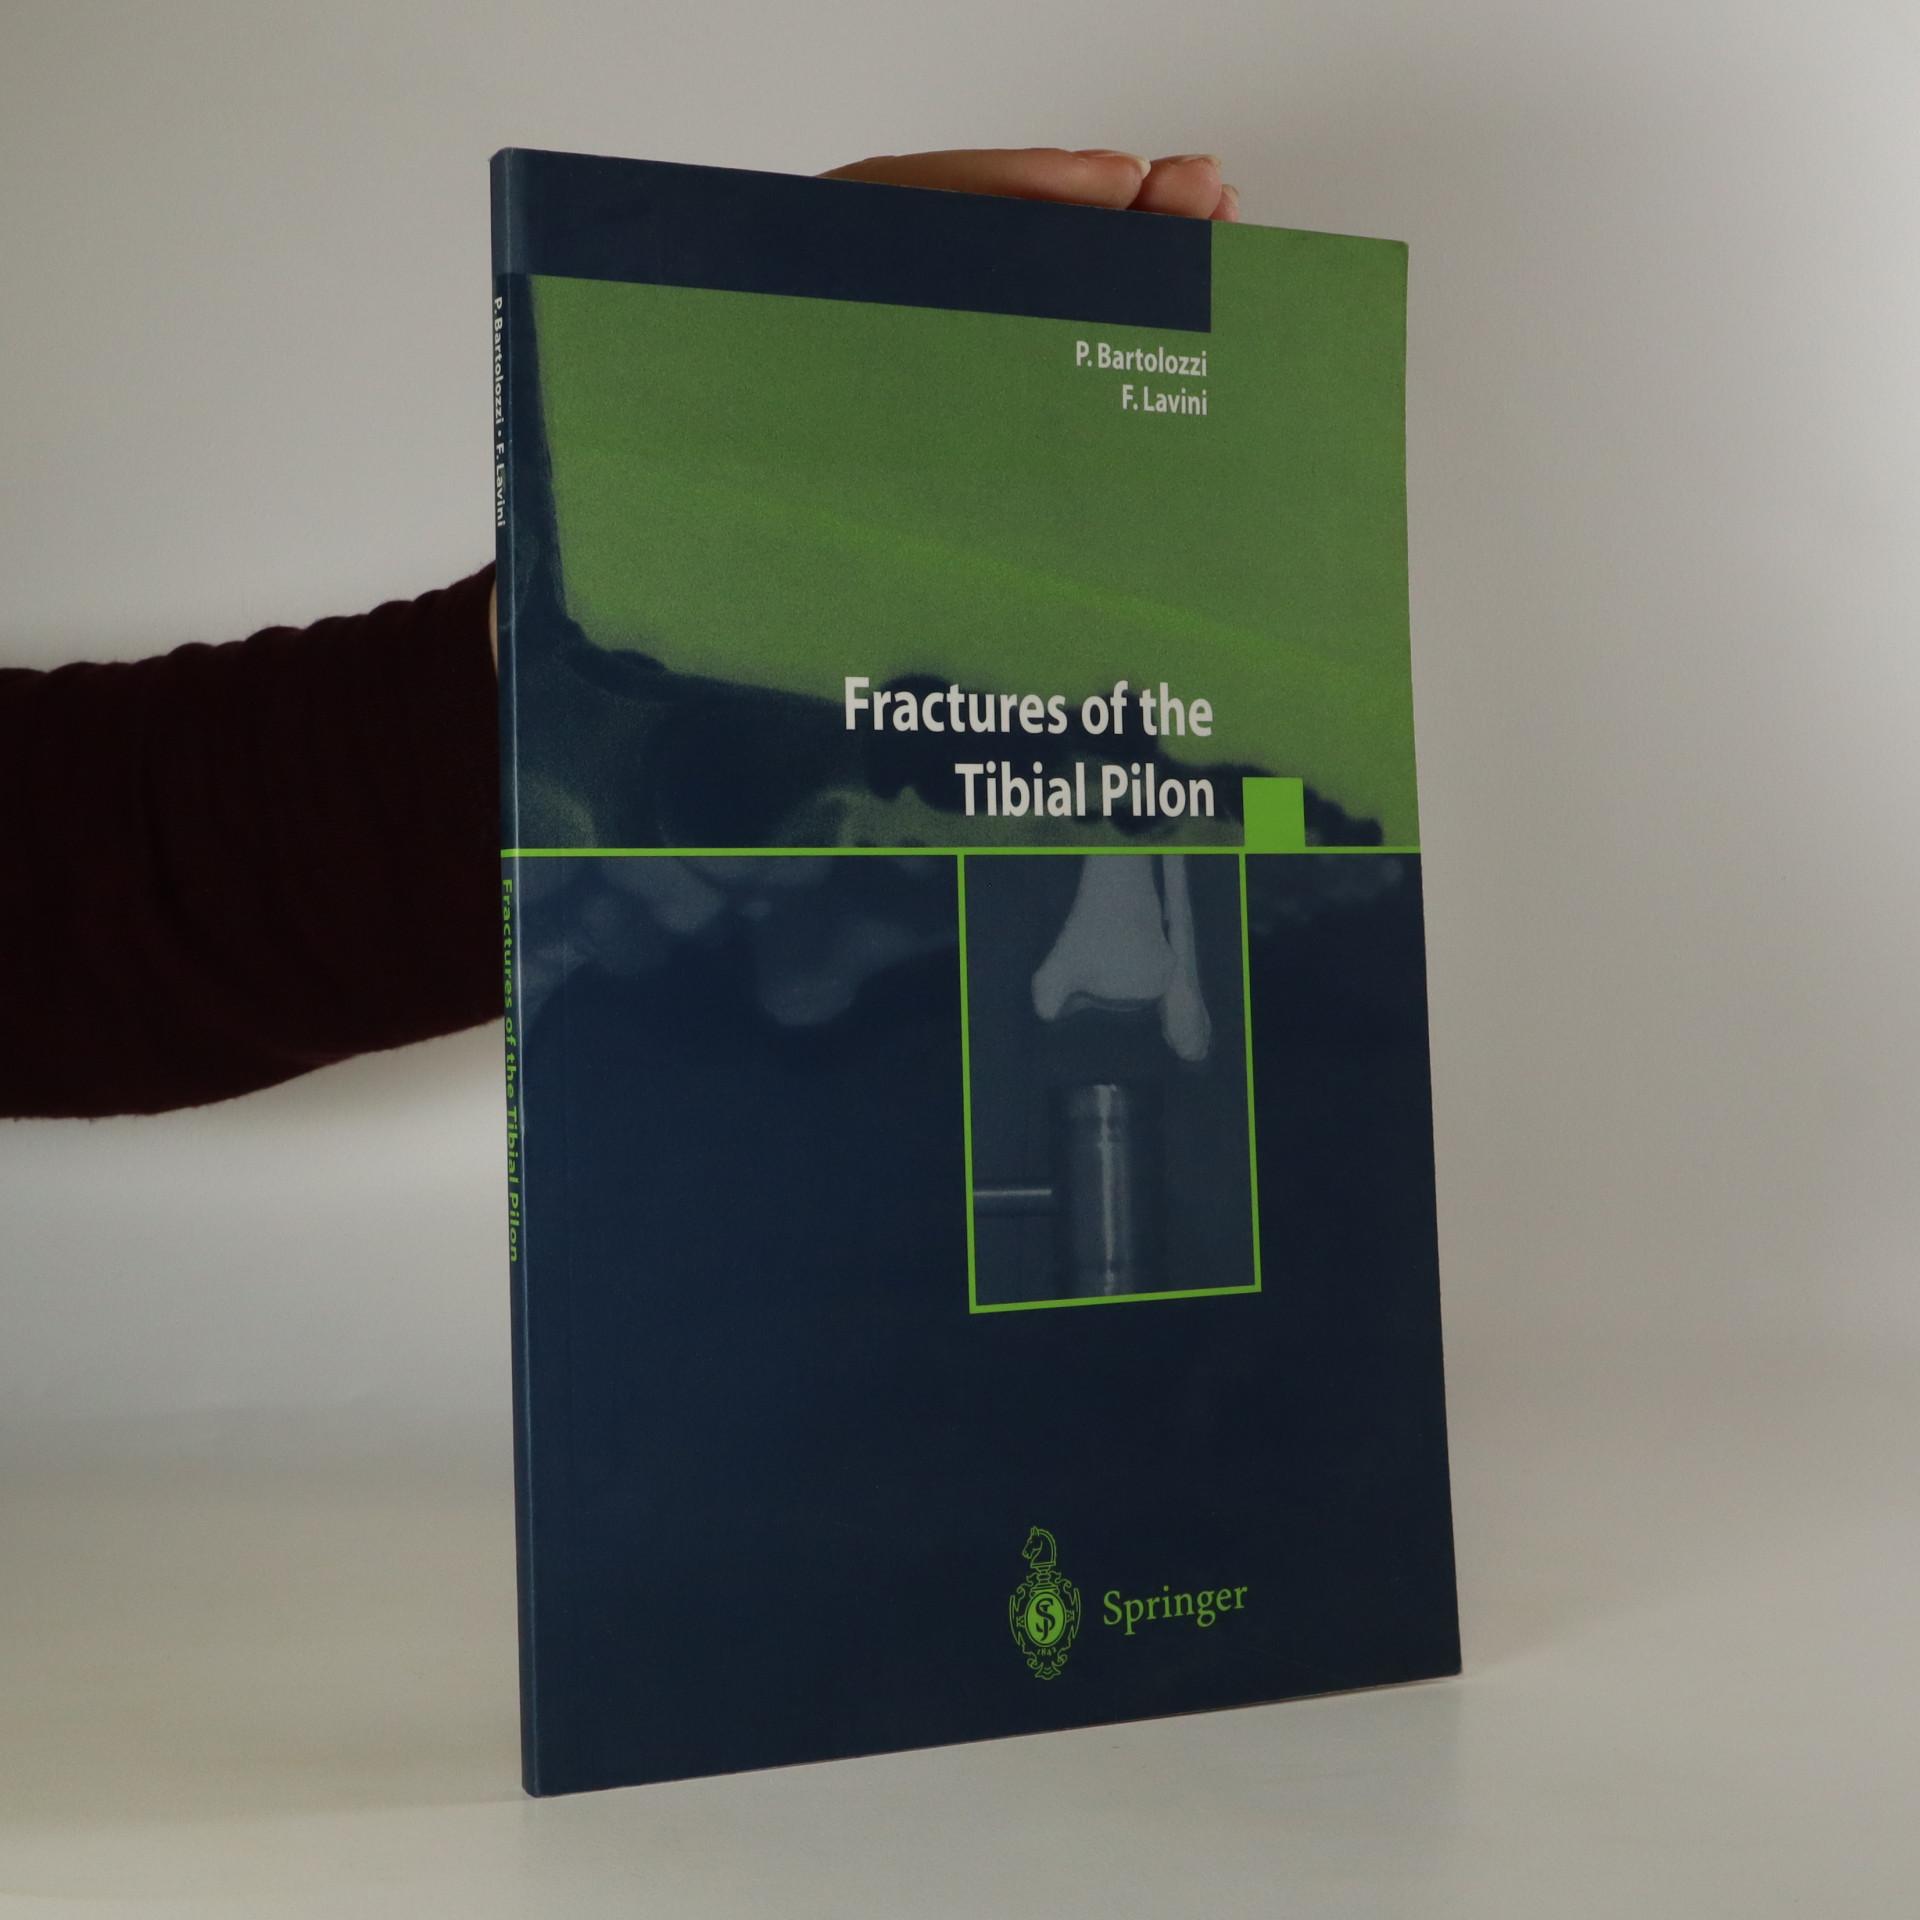 antikvární kniha Fractures of the Tibial Pilon, 2004